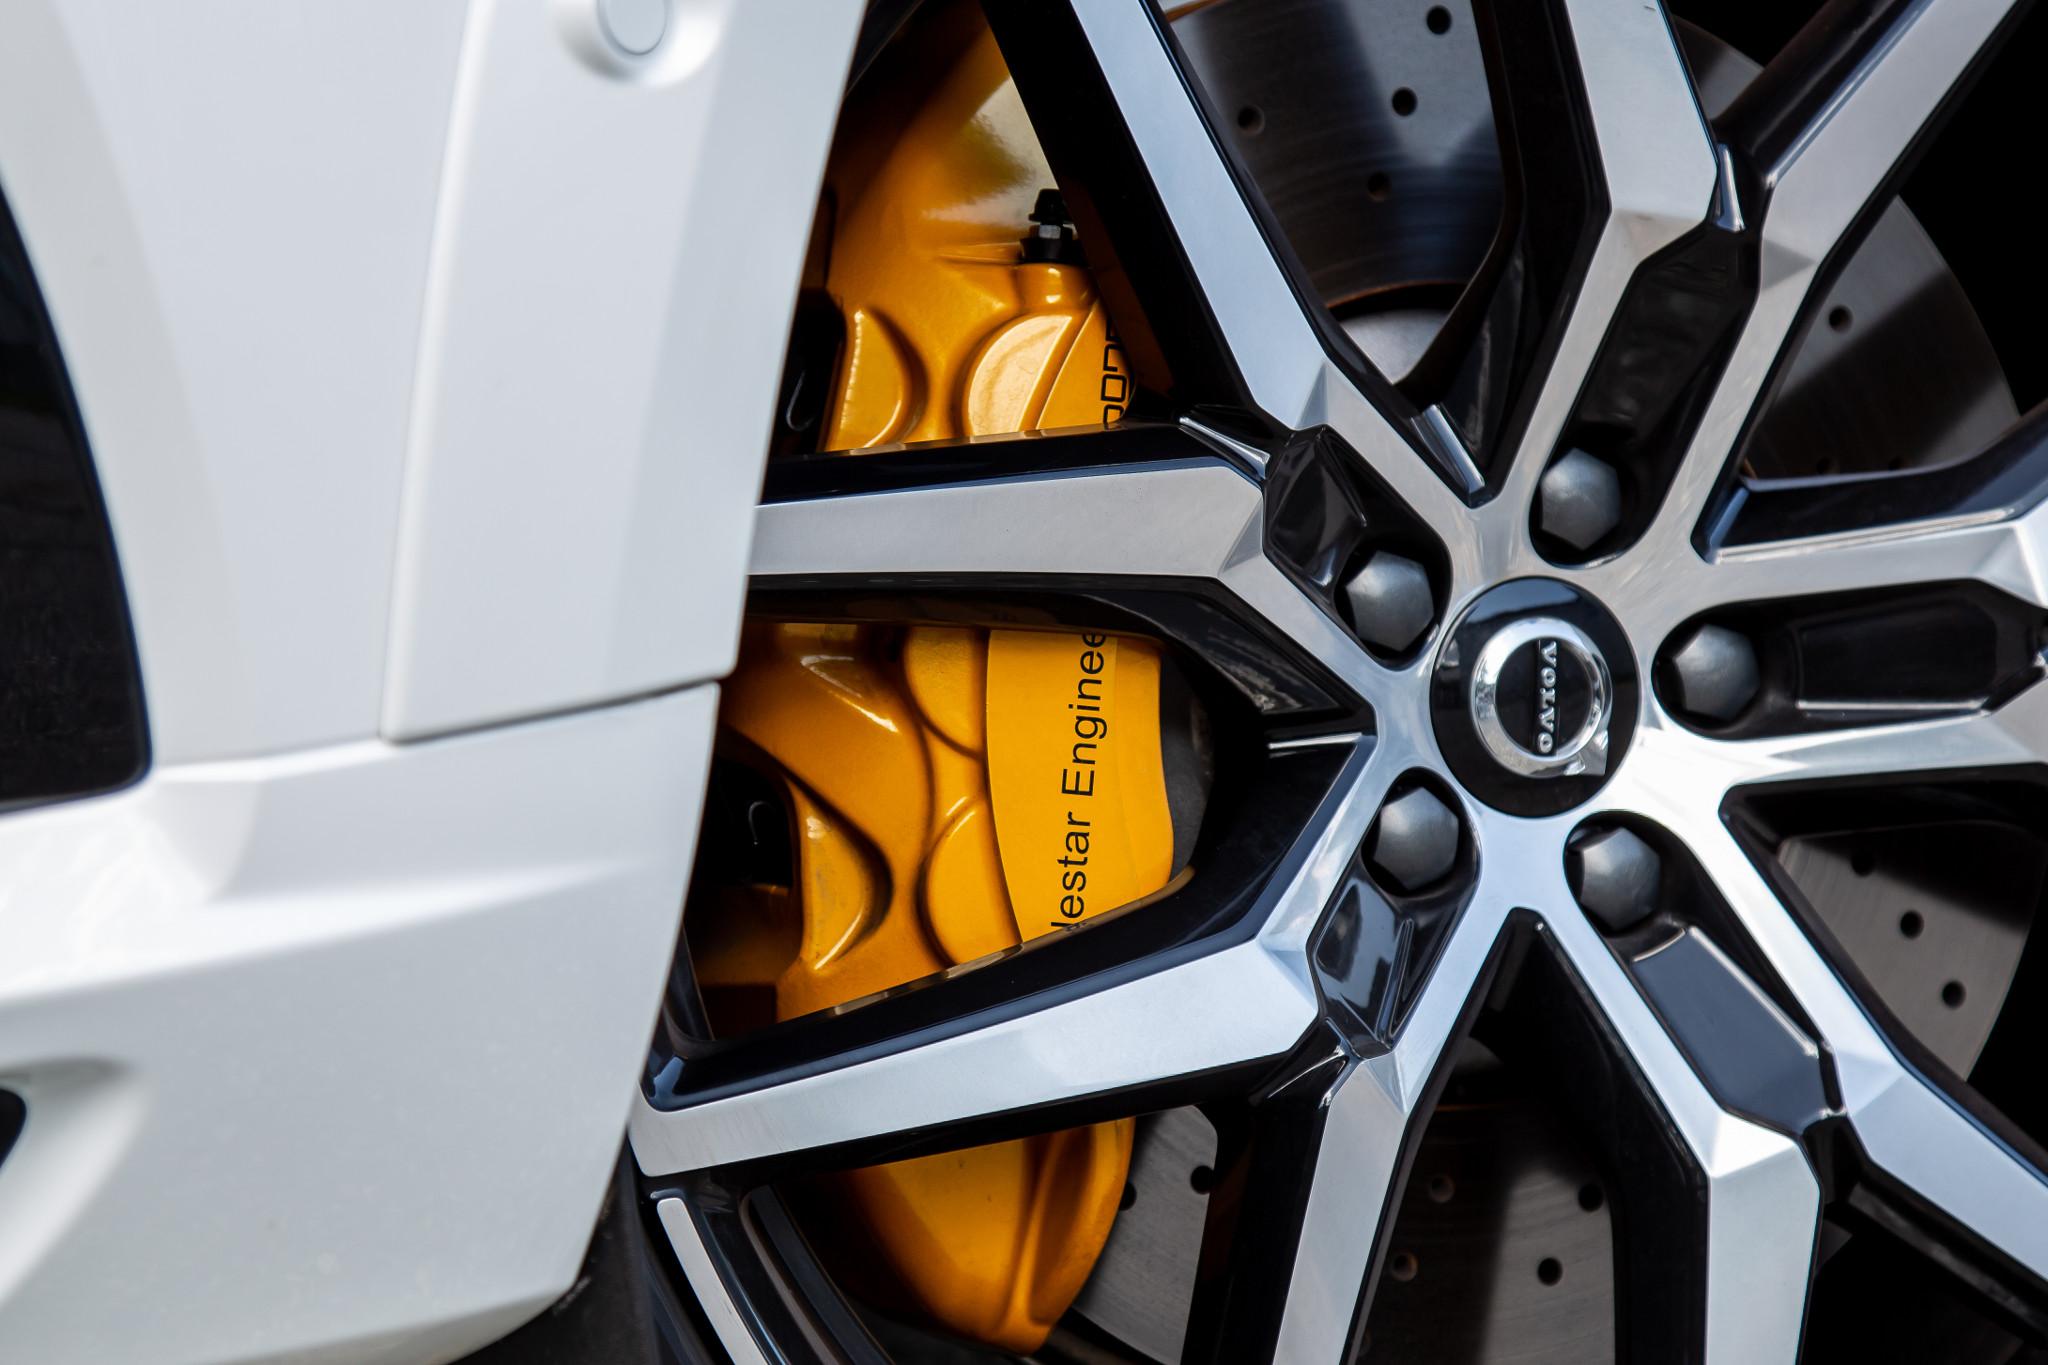 volvo-xc60-t8-polestar-2020-12-detail--exterior--wheel--white.jpg